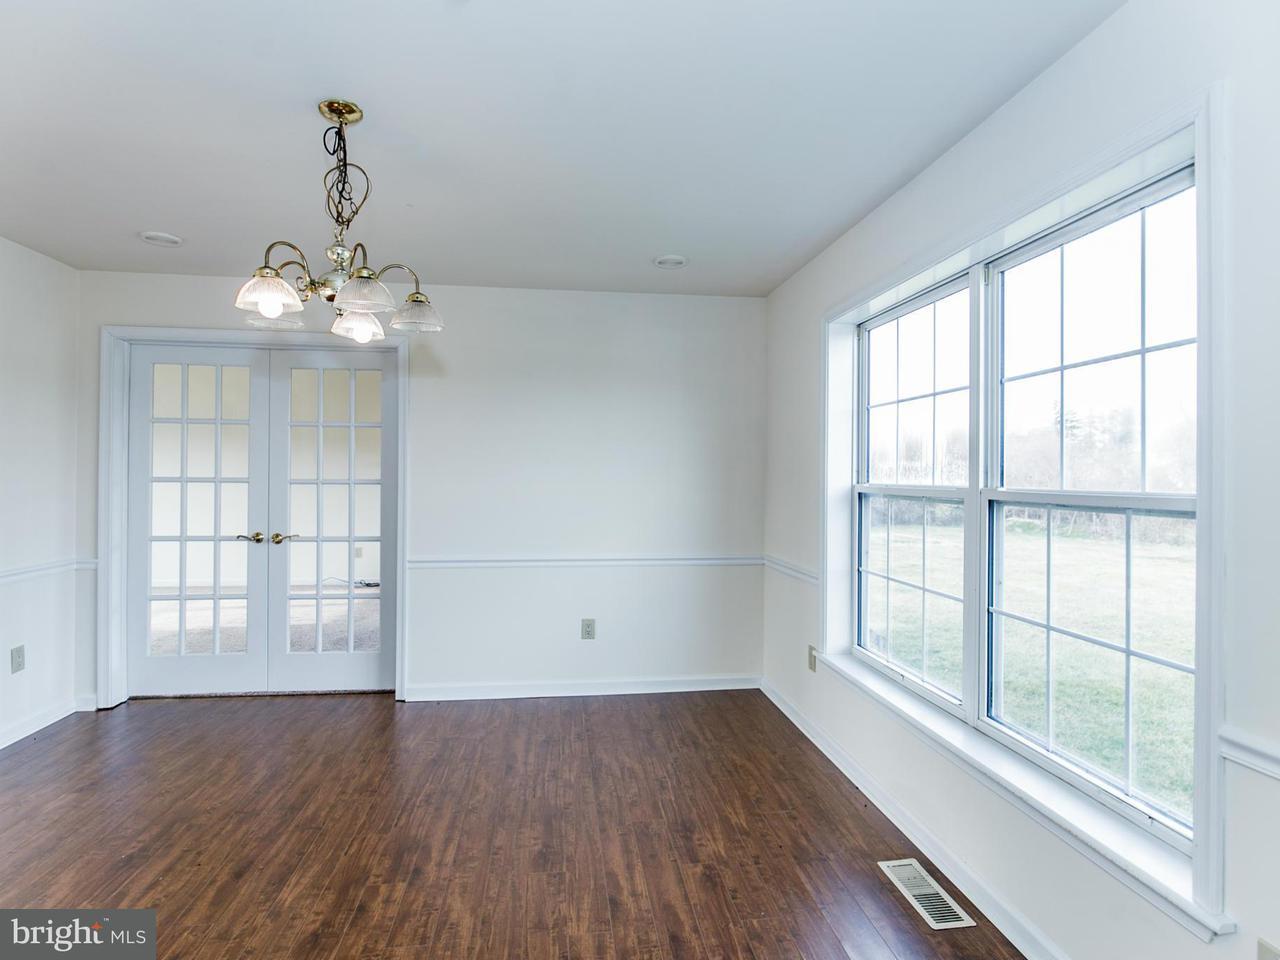 Additional photo for property listing at 36 MAIN Street 36 MAIN Street Warwick, Maryland 21912 Stati Uniti